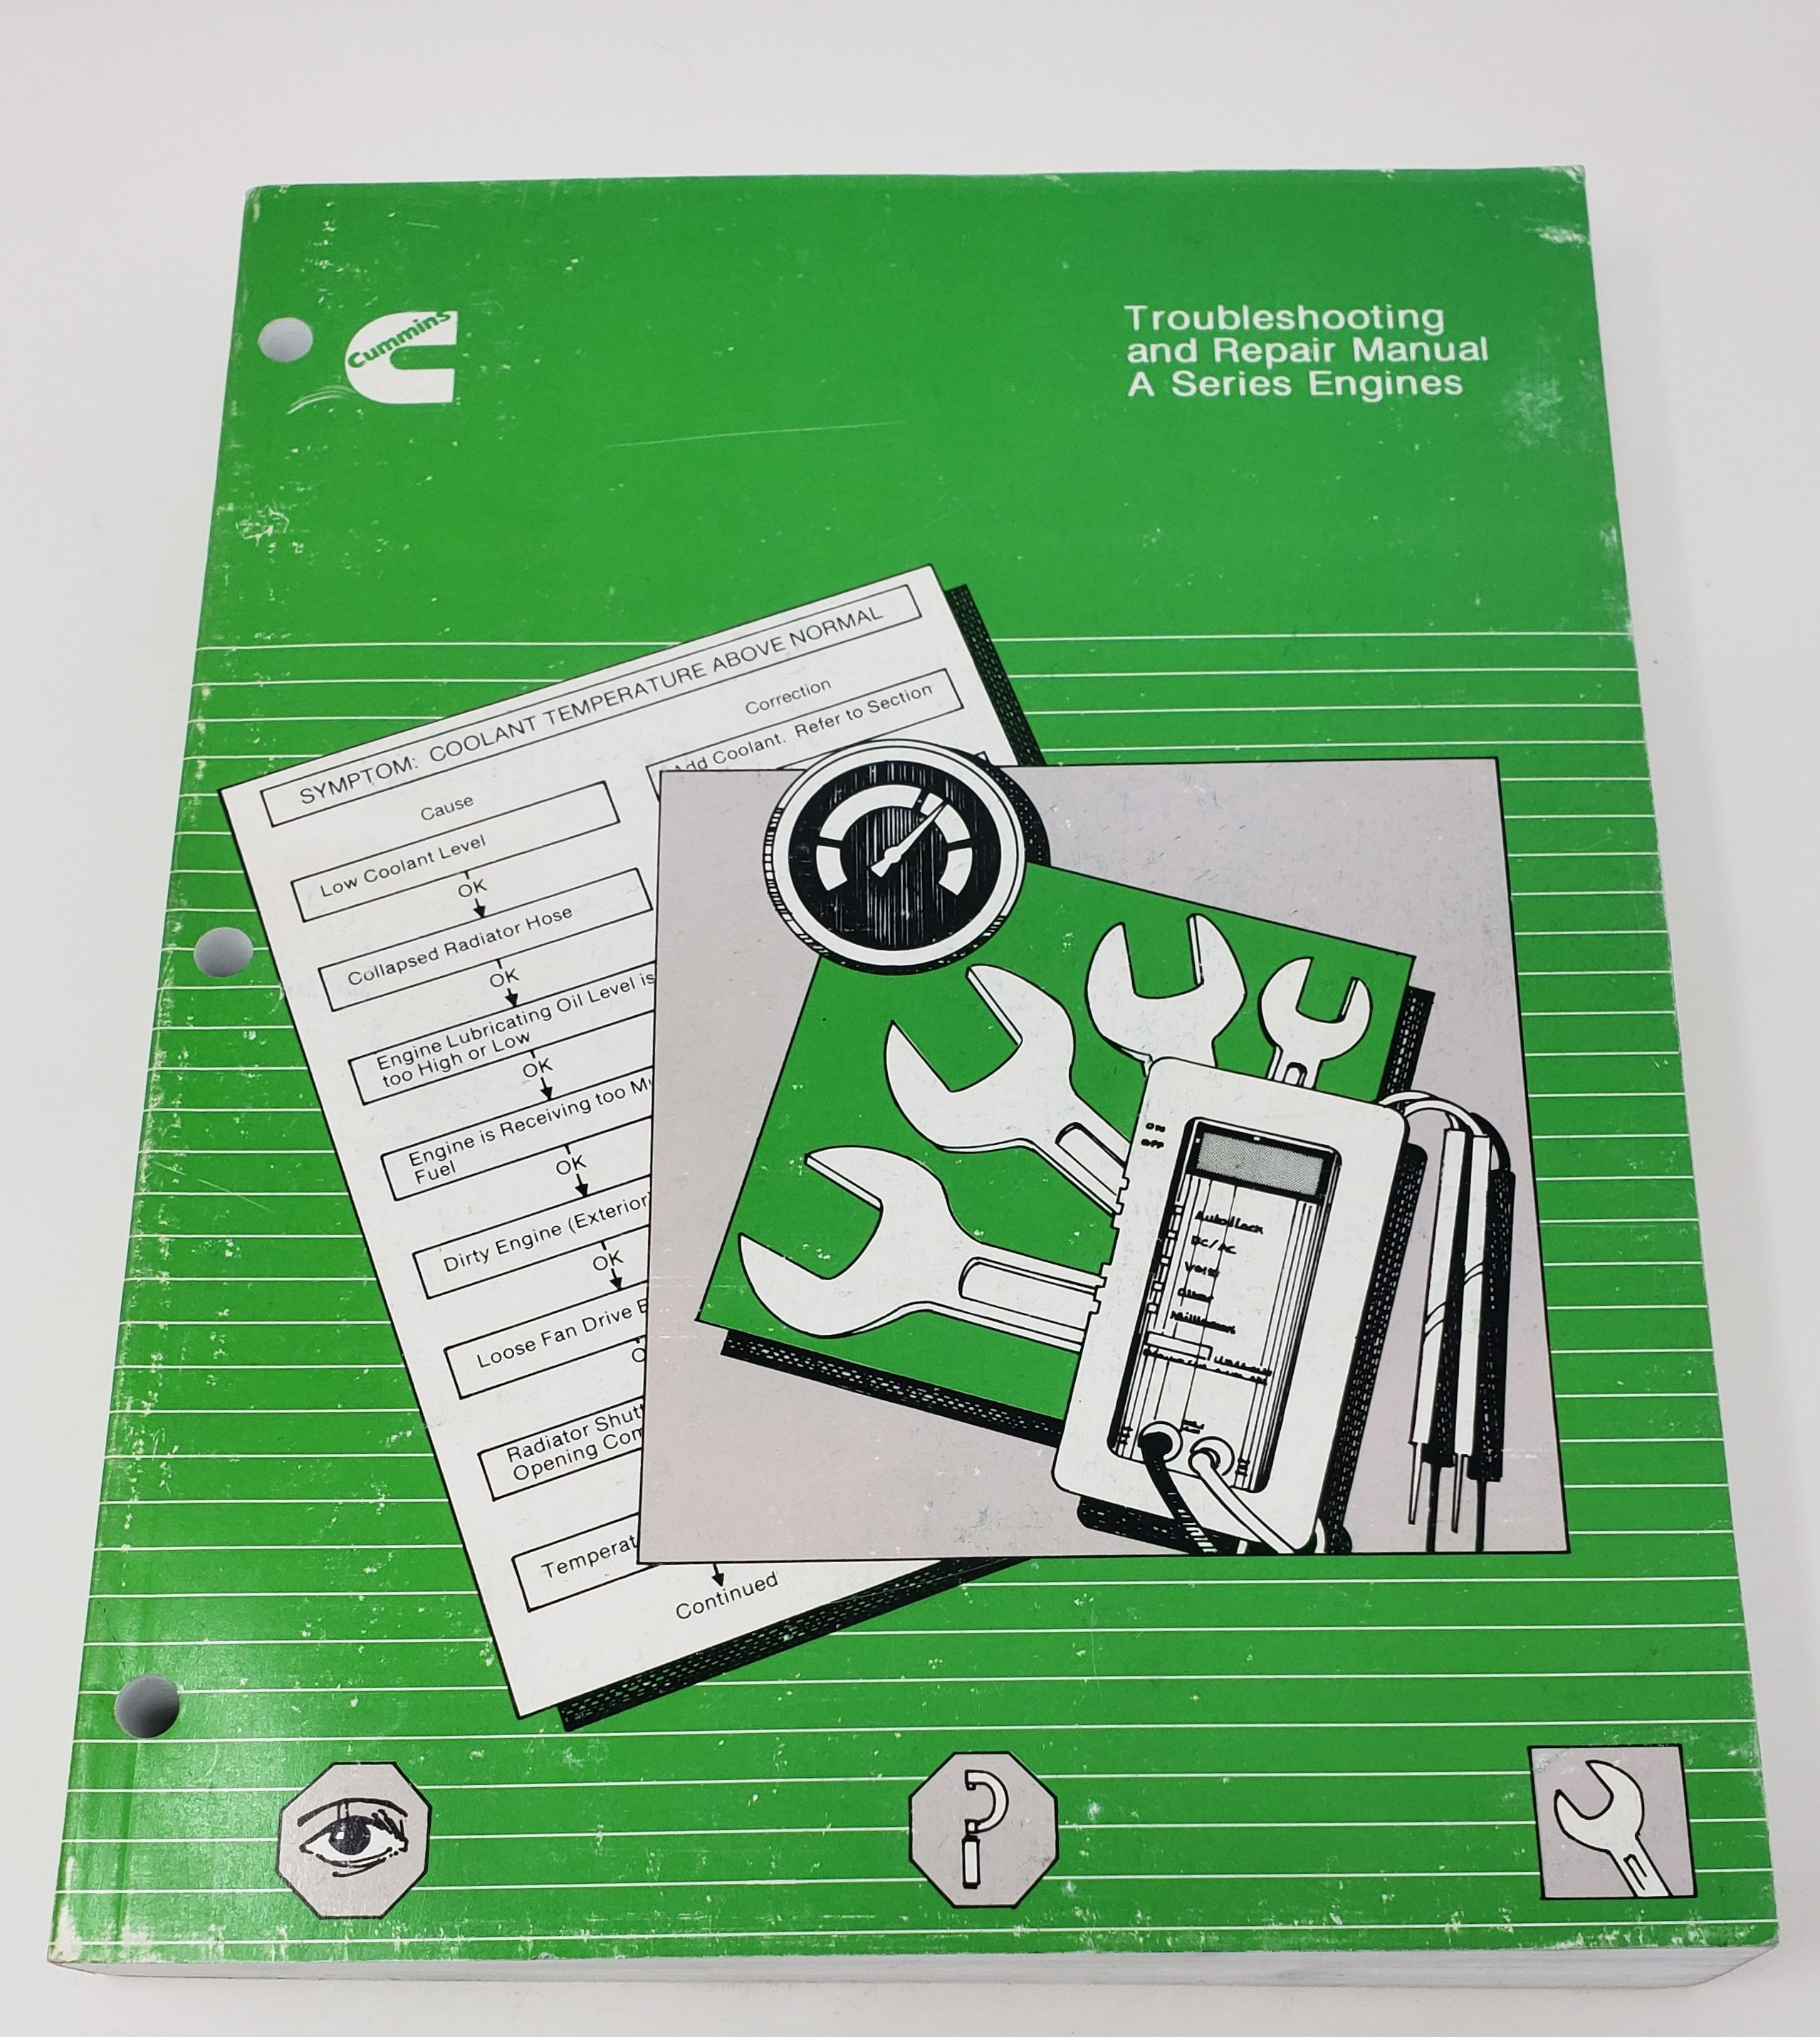 1990 Cummins Troubleshooting Repair Manual A Series Engines 3810398 00 Repair Manuals Cummins Repair